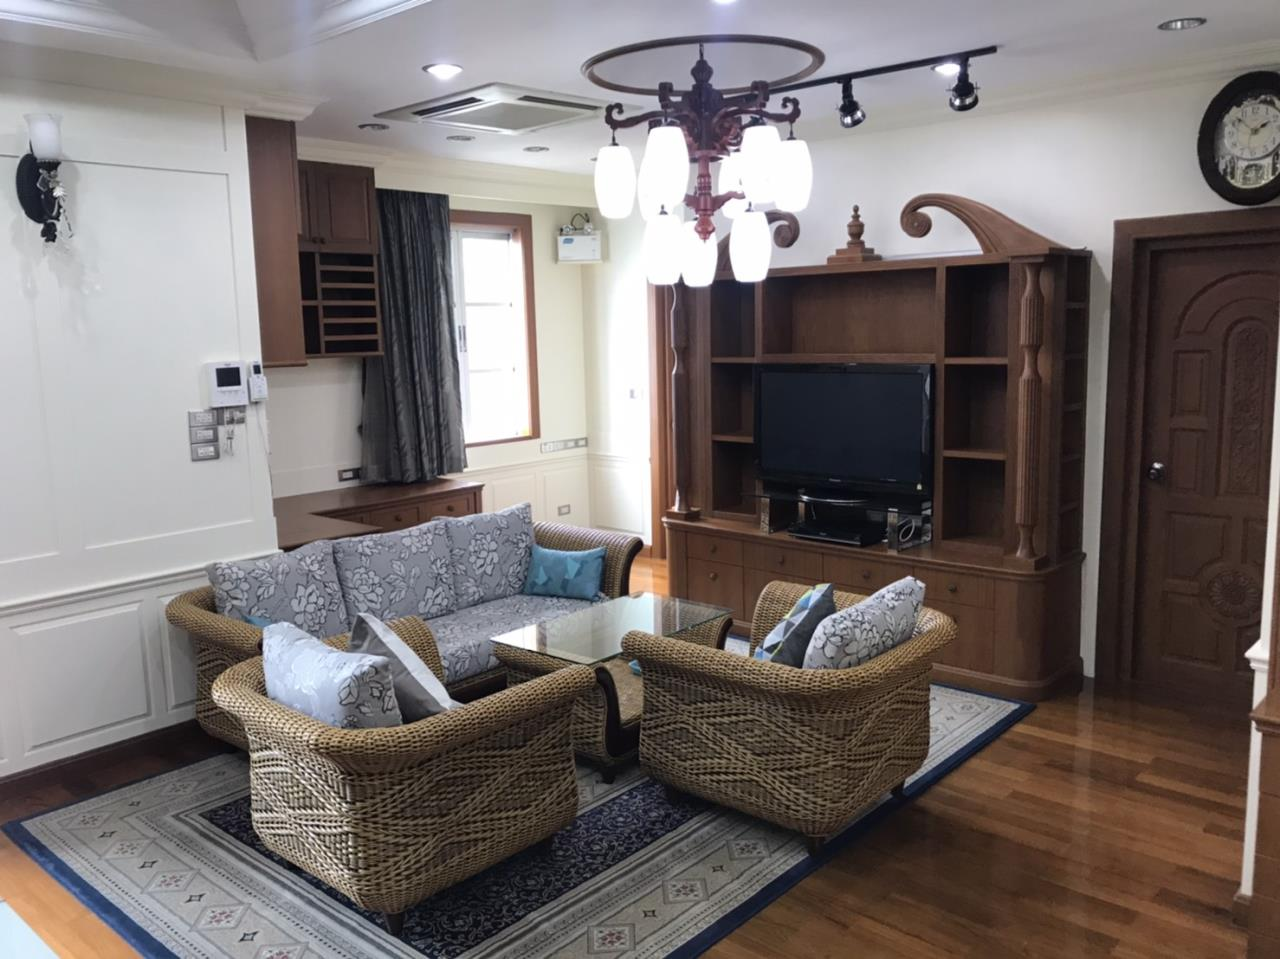 Blueocean property Agency's Condo For Rent – Condo Citismart Sukhumvit 18 7